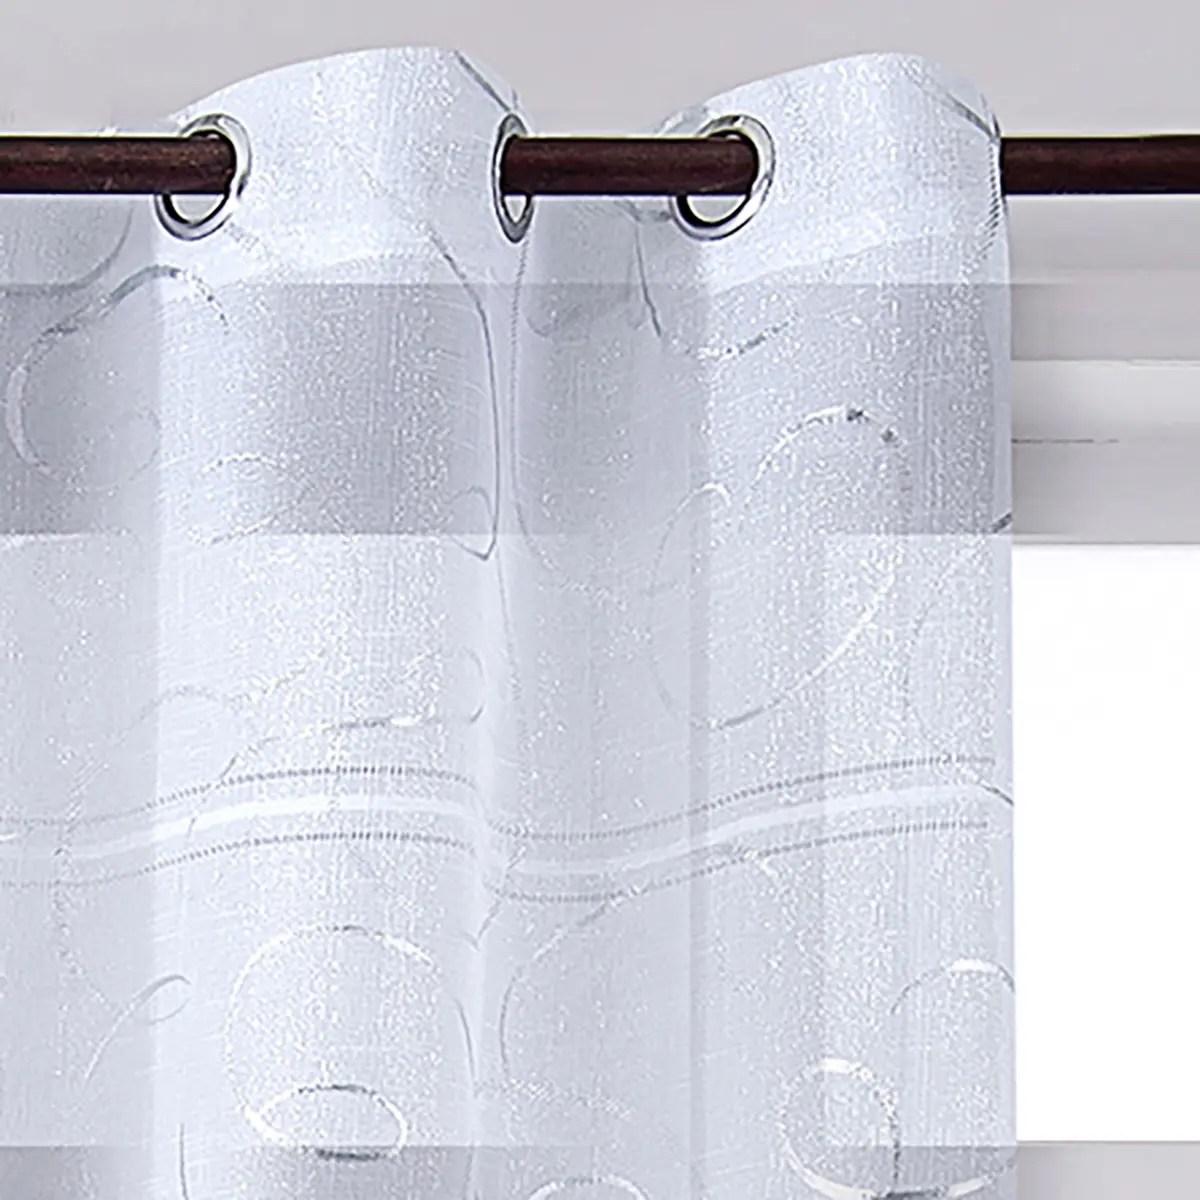 blanc 300x240cm dimensions best